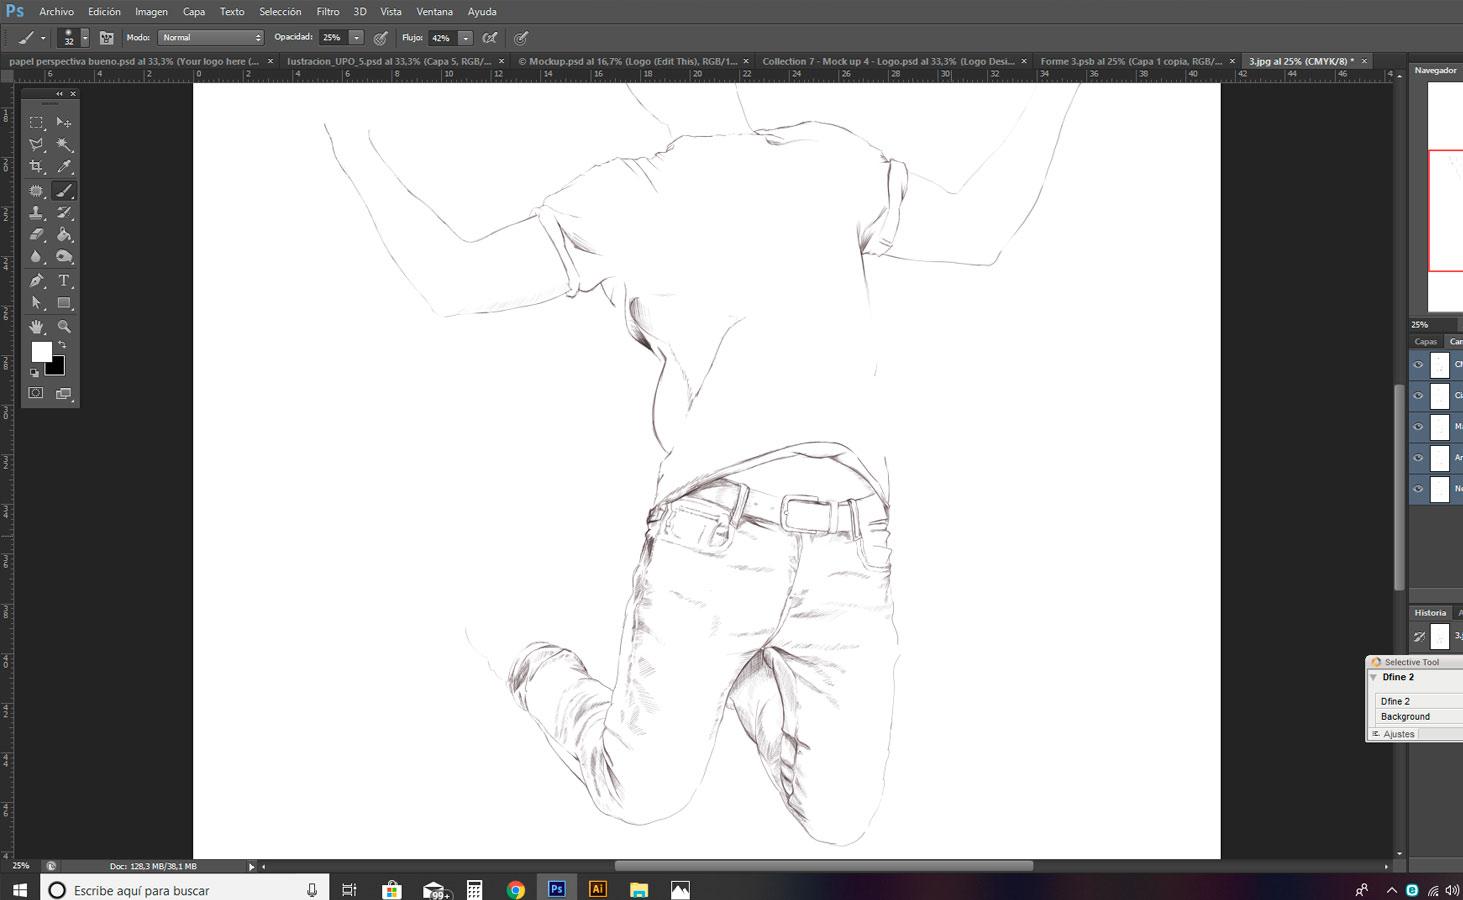 Iustracion_UPO_6